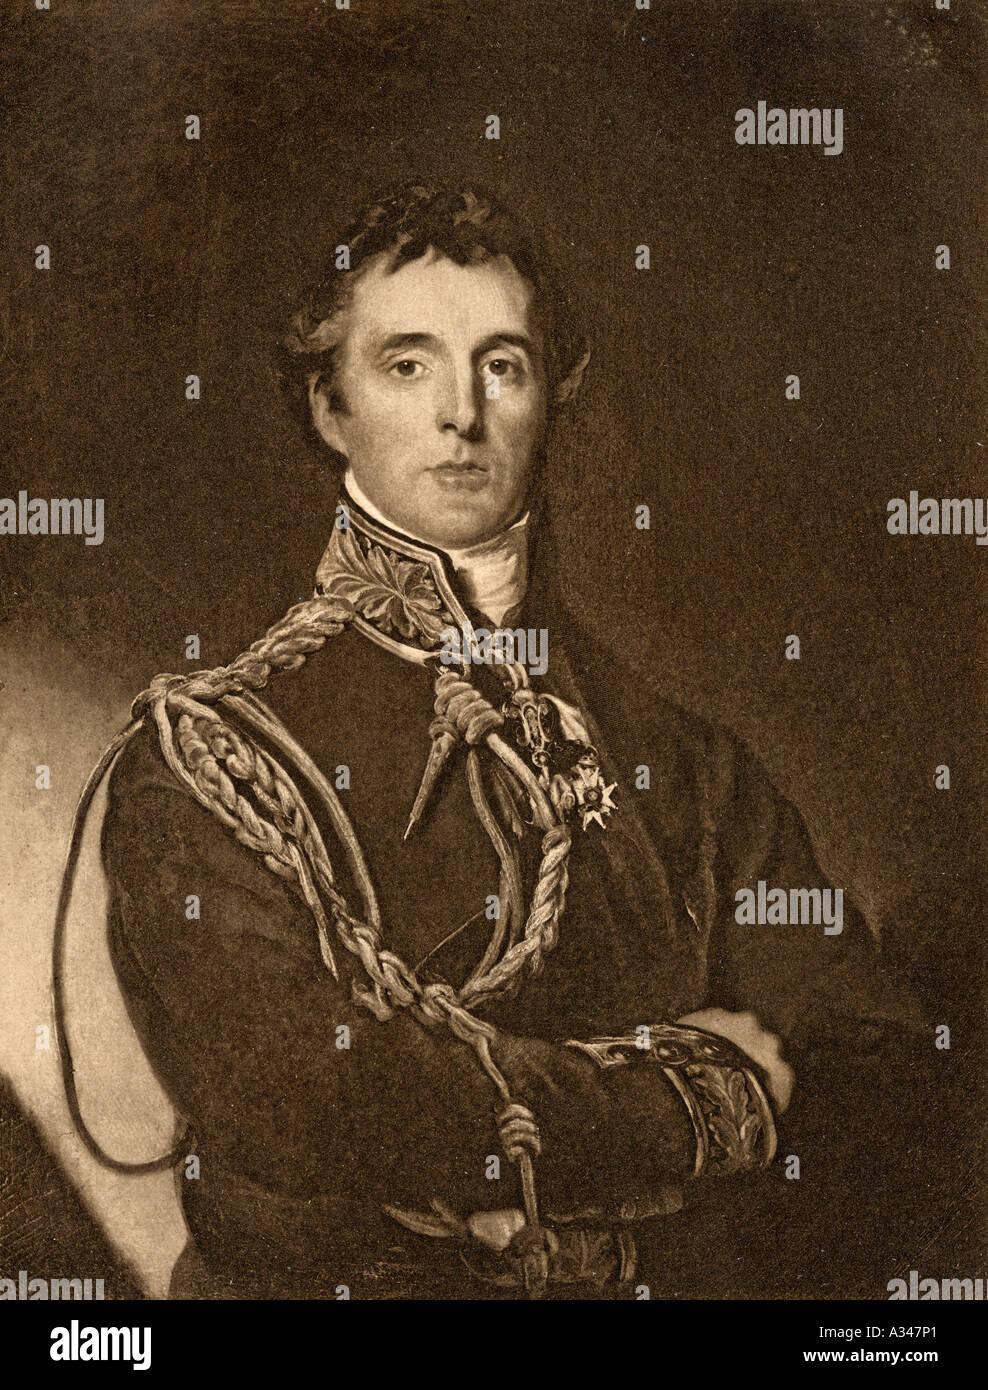 Arthur Wellesley 1st Duke of Wellington 1769 1852 British soldier and statesman - Stock Image